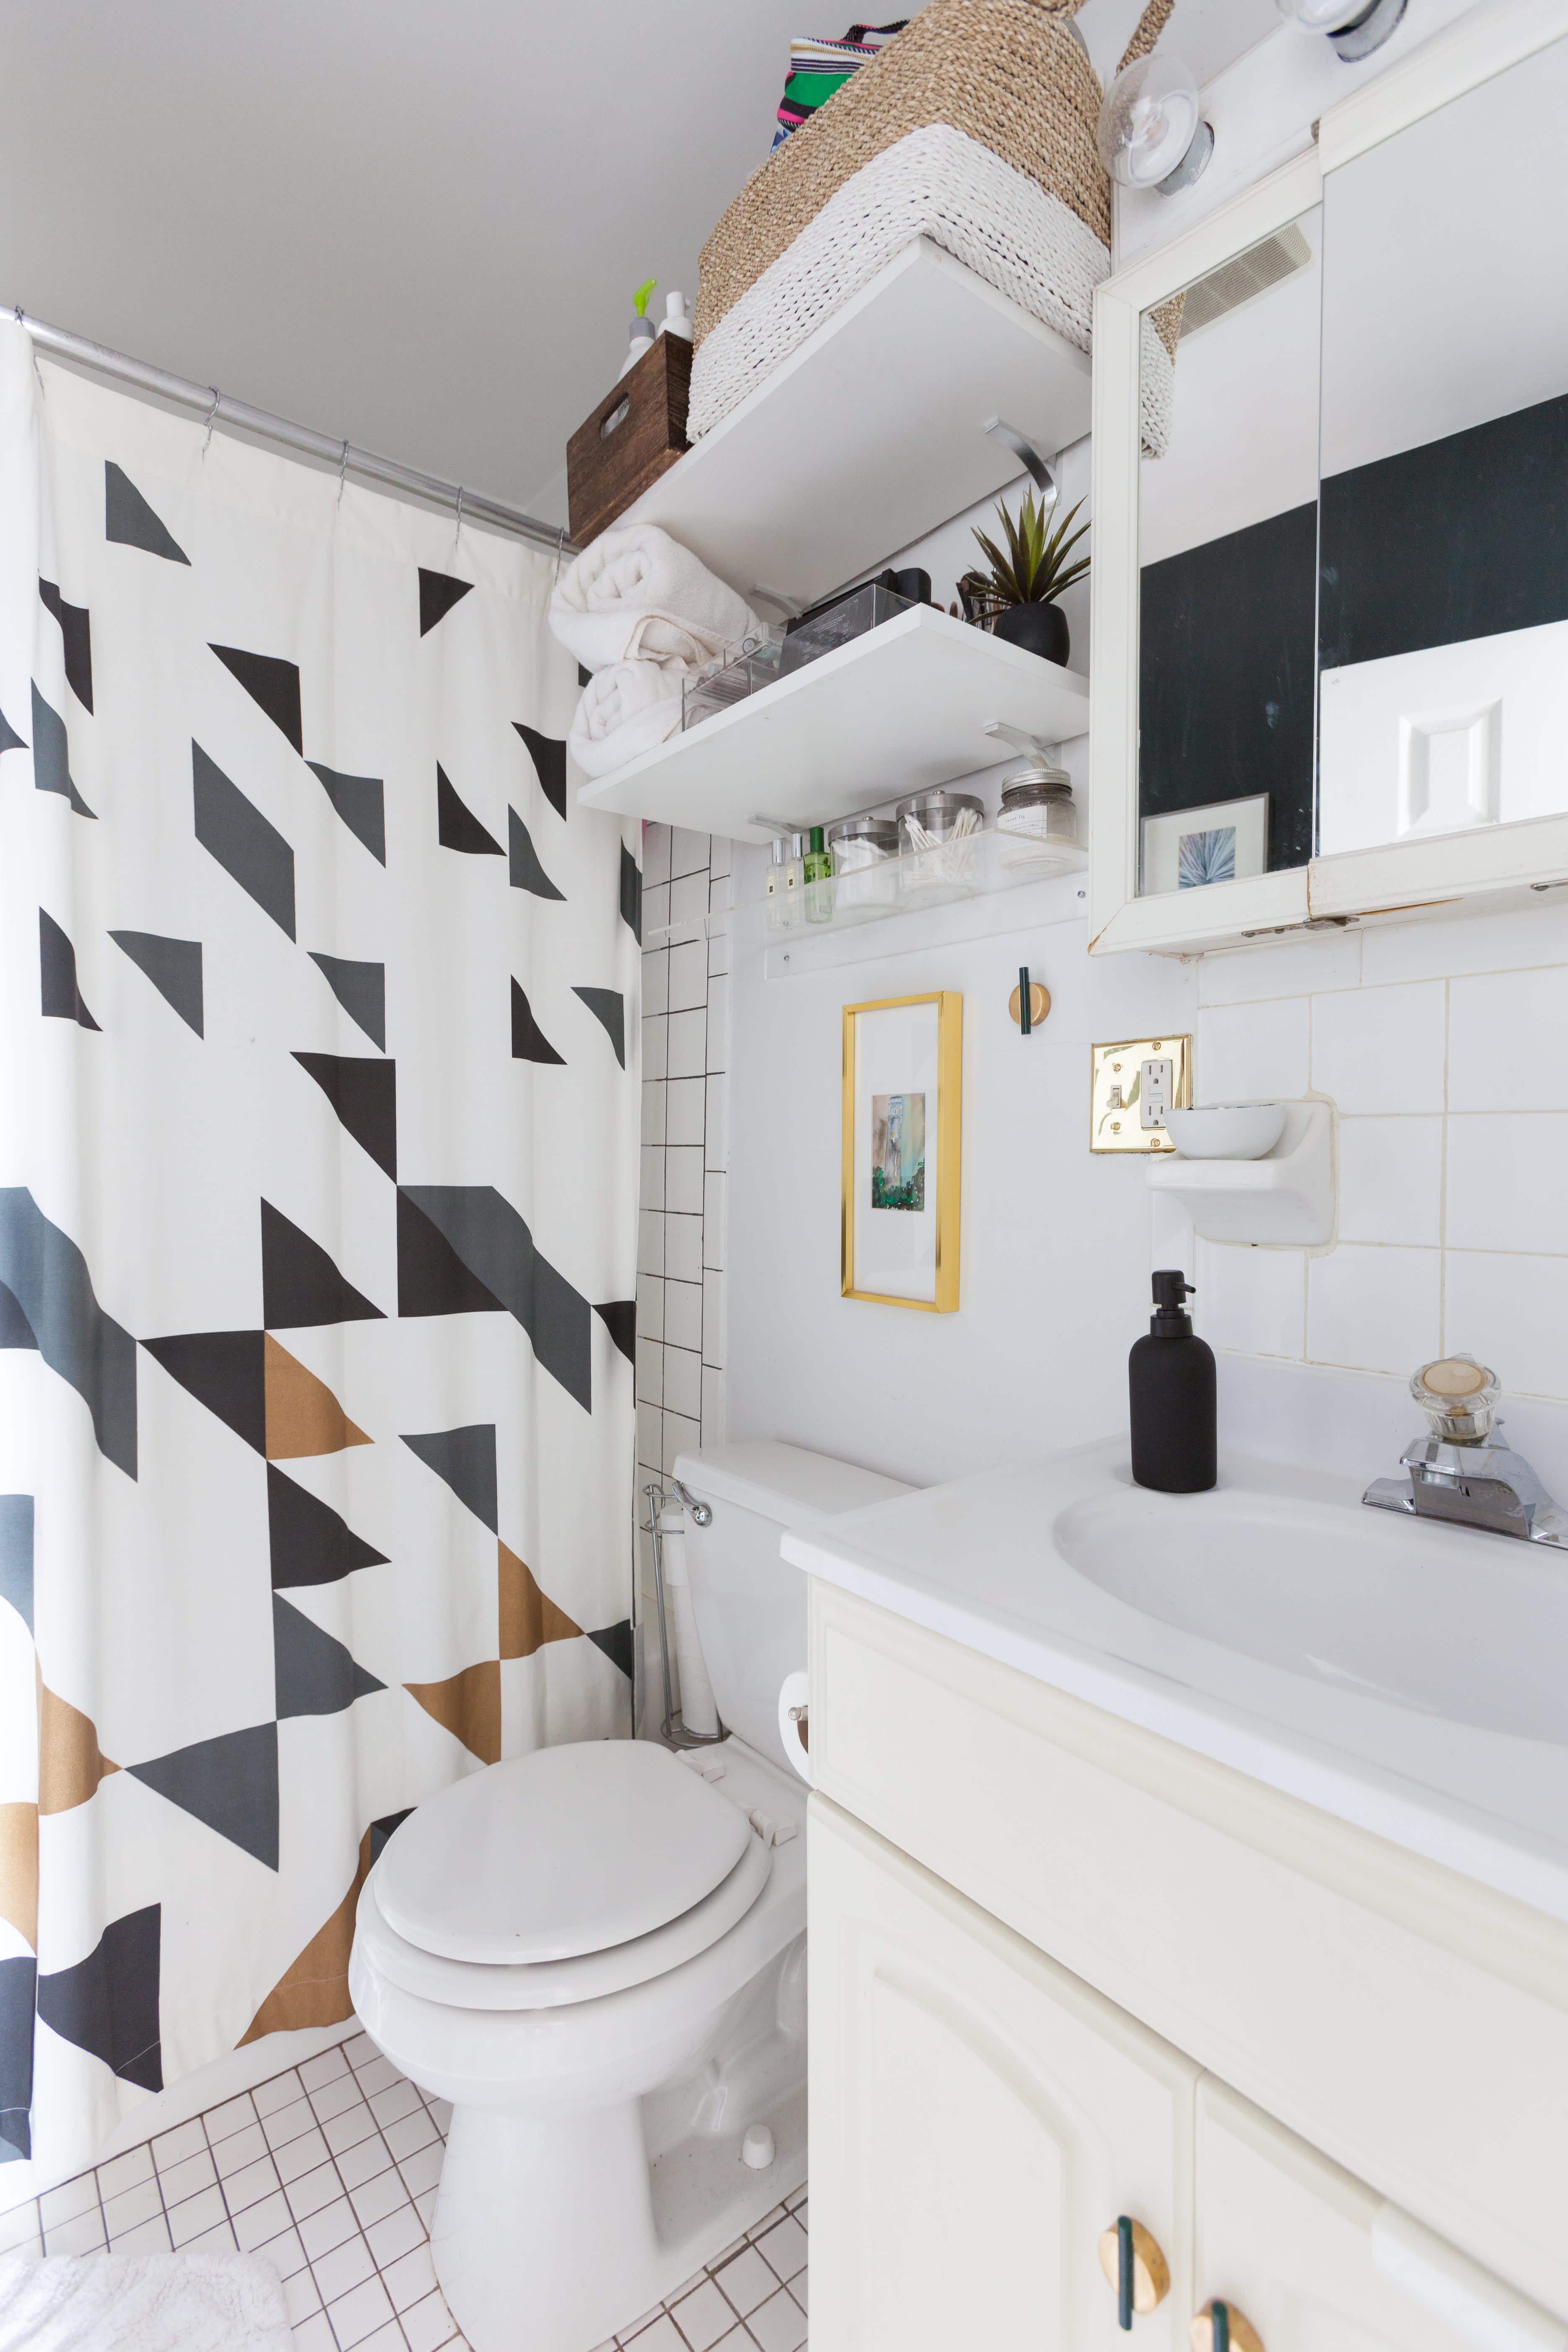 Small Bathroom Design & Storage Ideas | Apartment Therapy on Bathroom Ideas For Apartments  id=74611